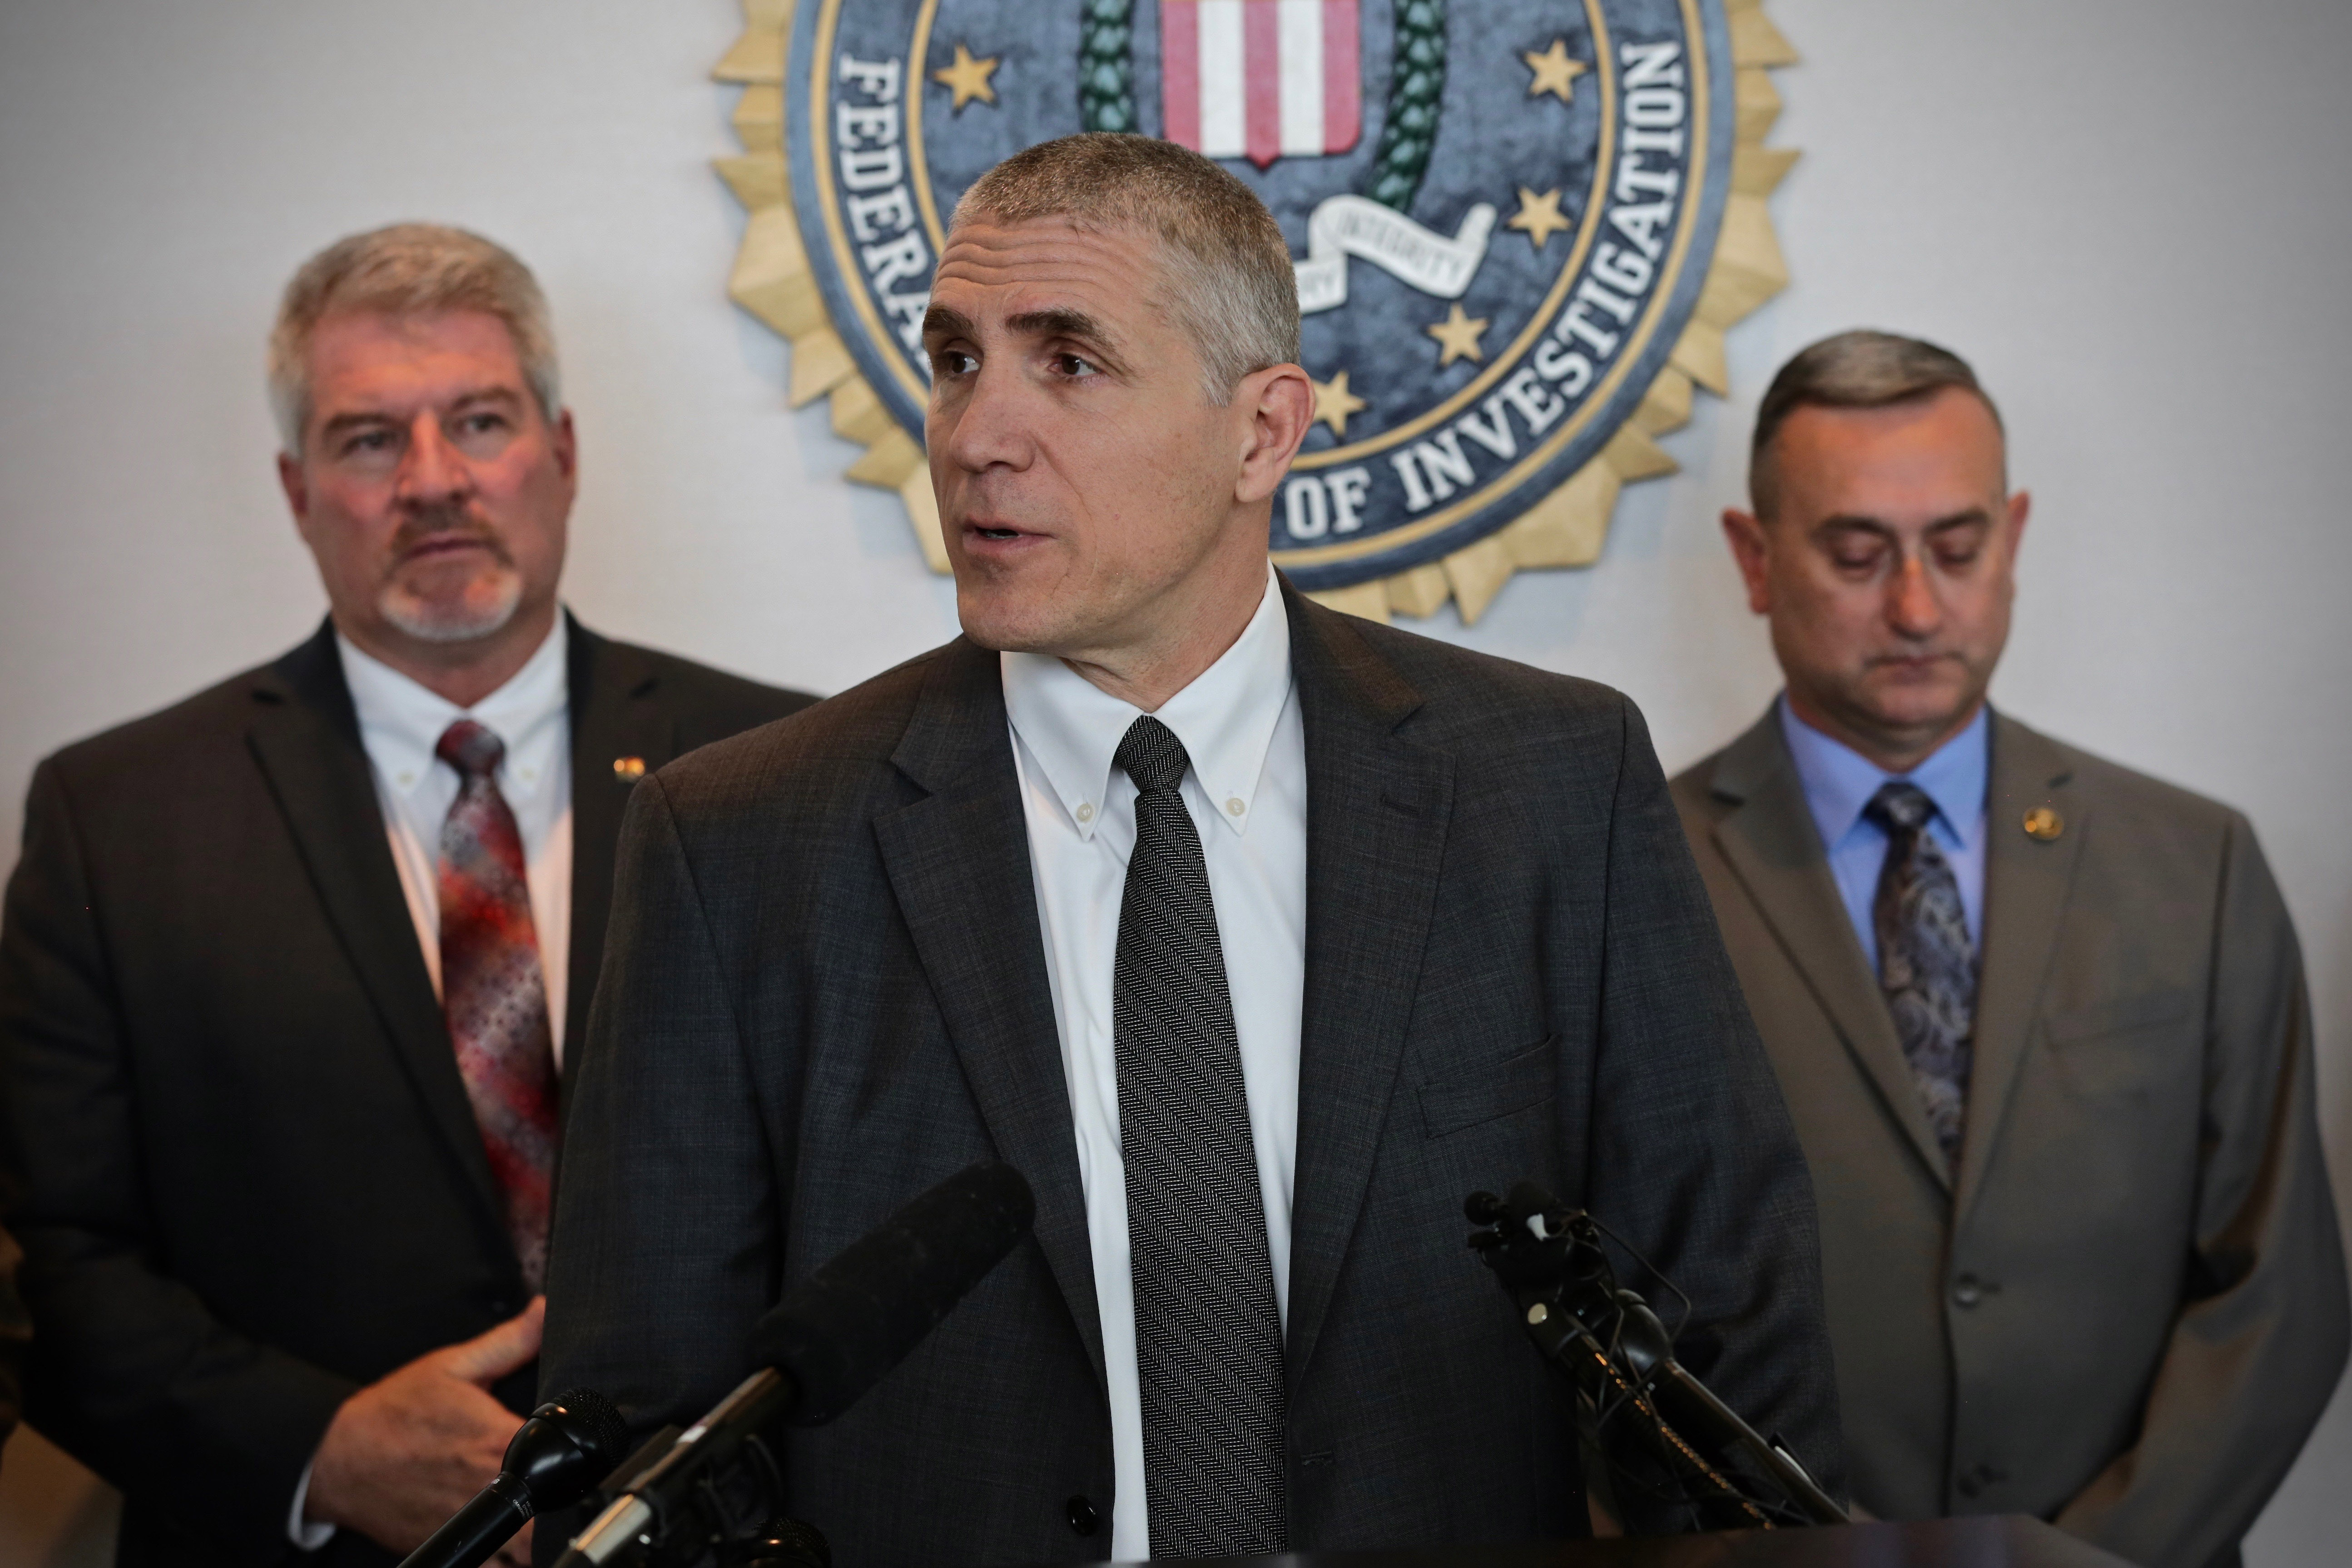 Photo: Sol Pais Manhunt 3 | FBI Dean Phillips - HVD